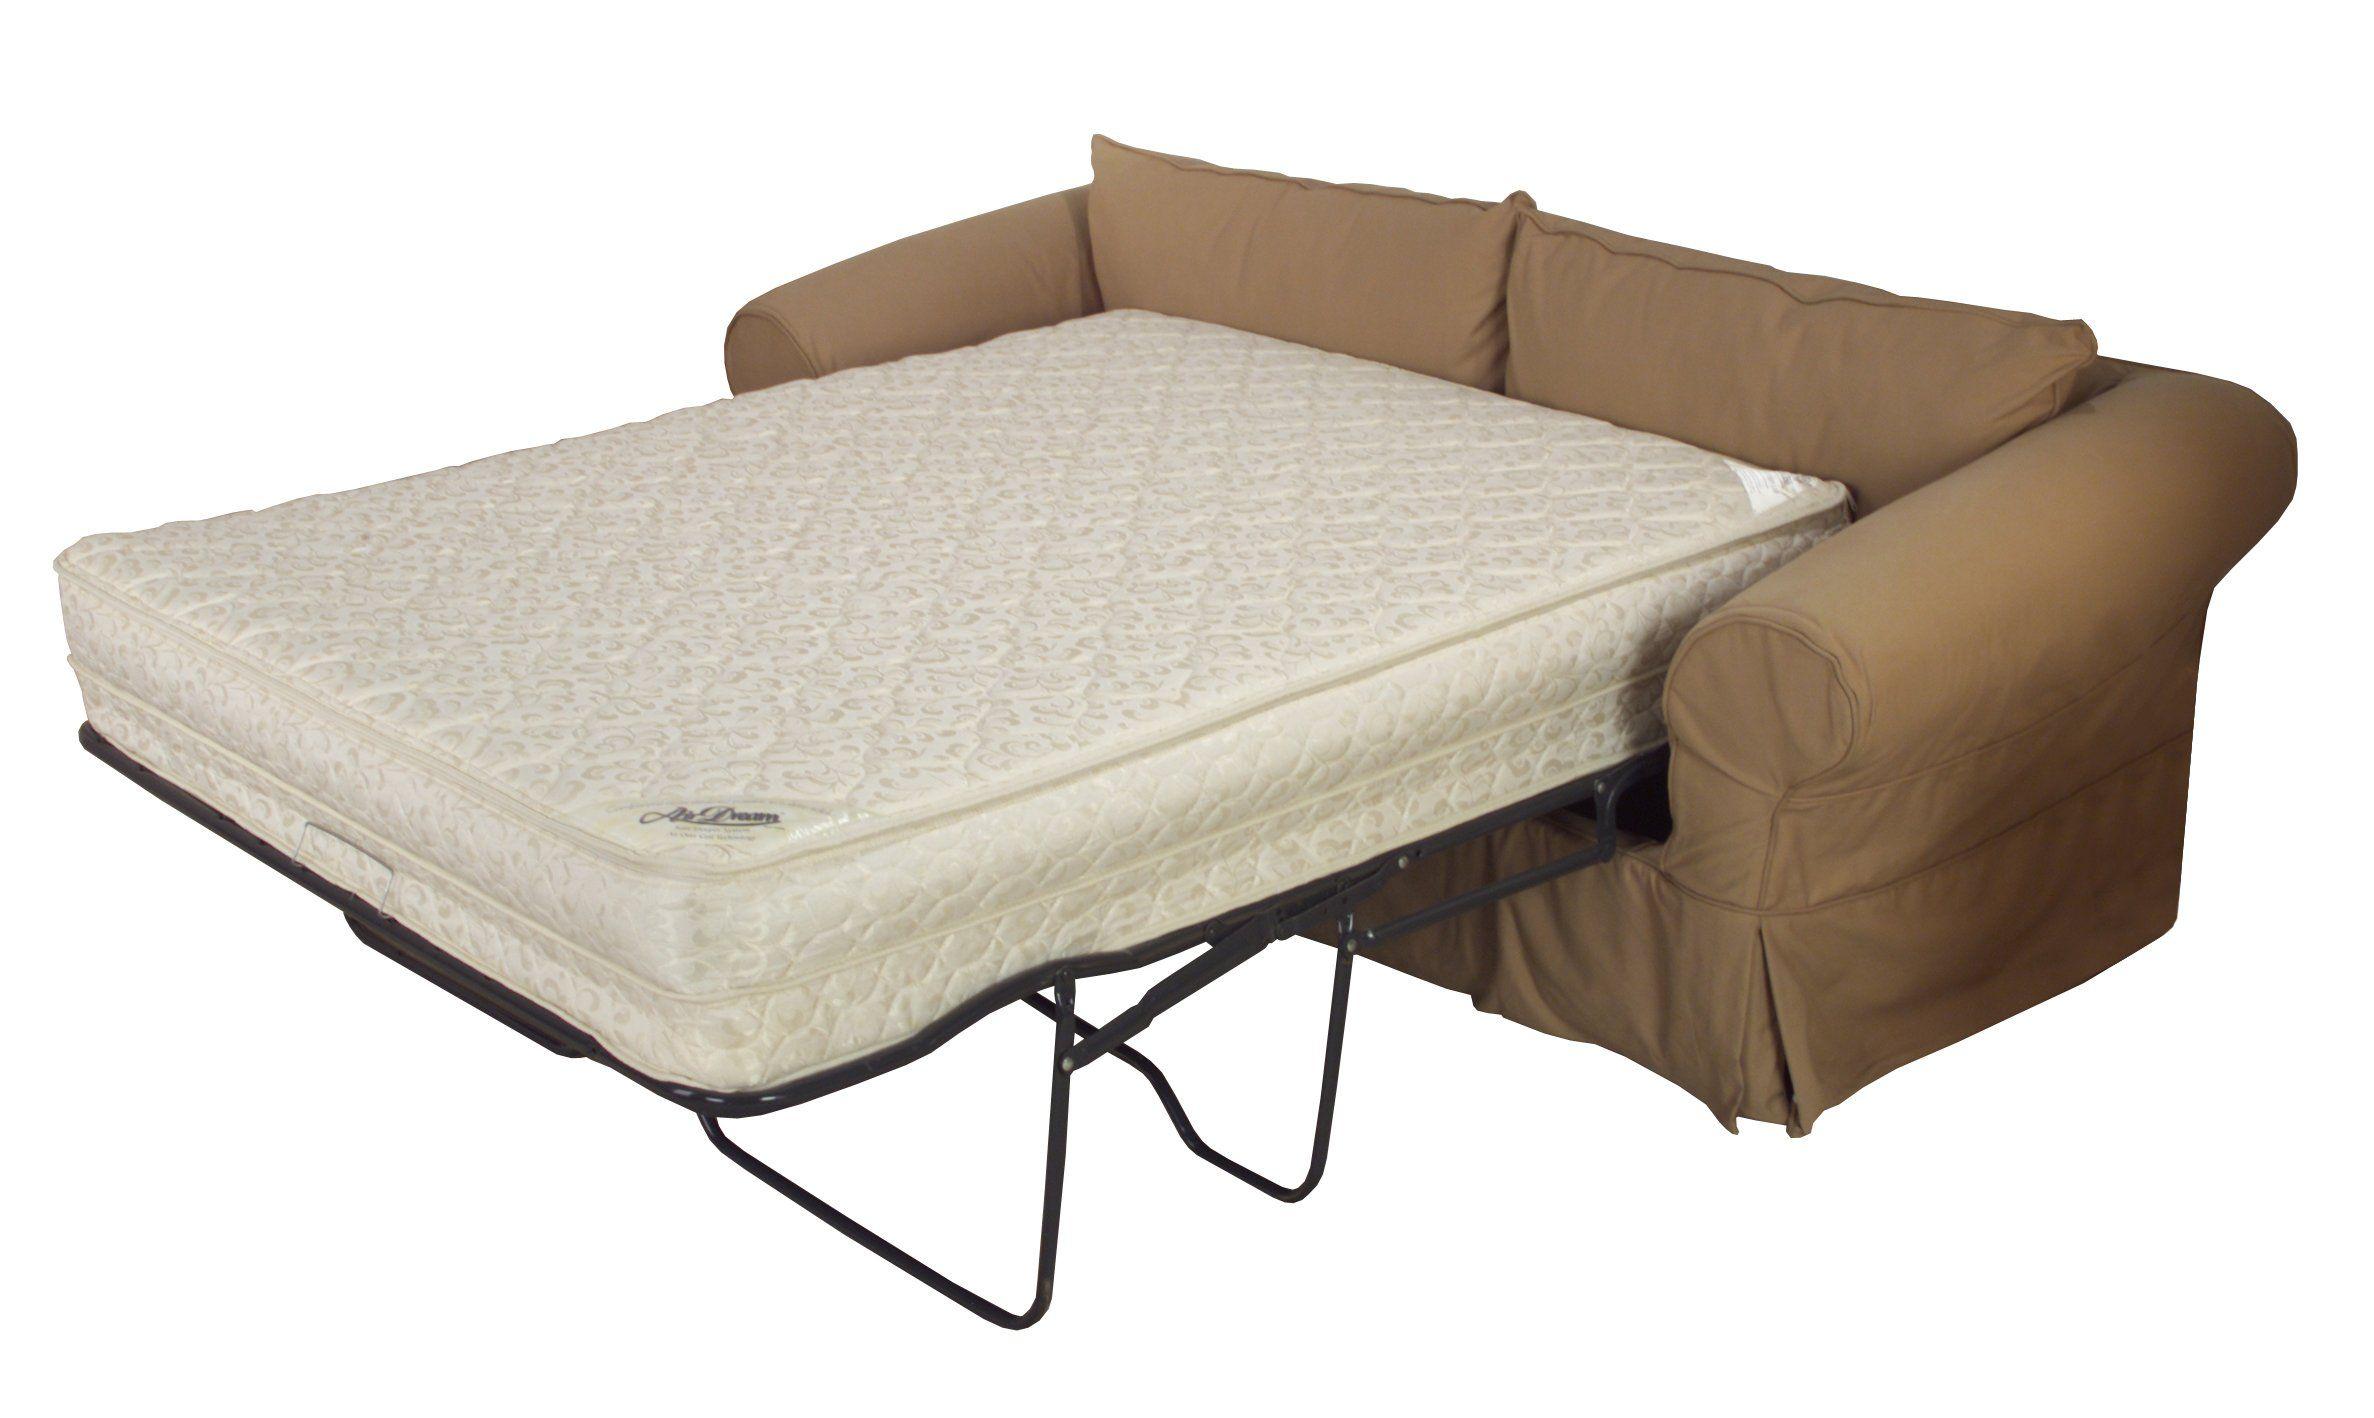 bedroom sleeper twin of most minimalist west ideas amazing modern sofas house elm comfortable sofa design lovely henry